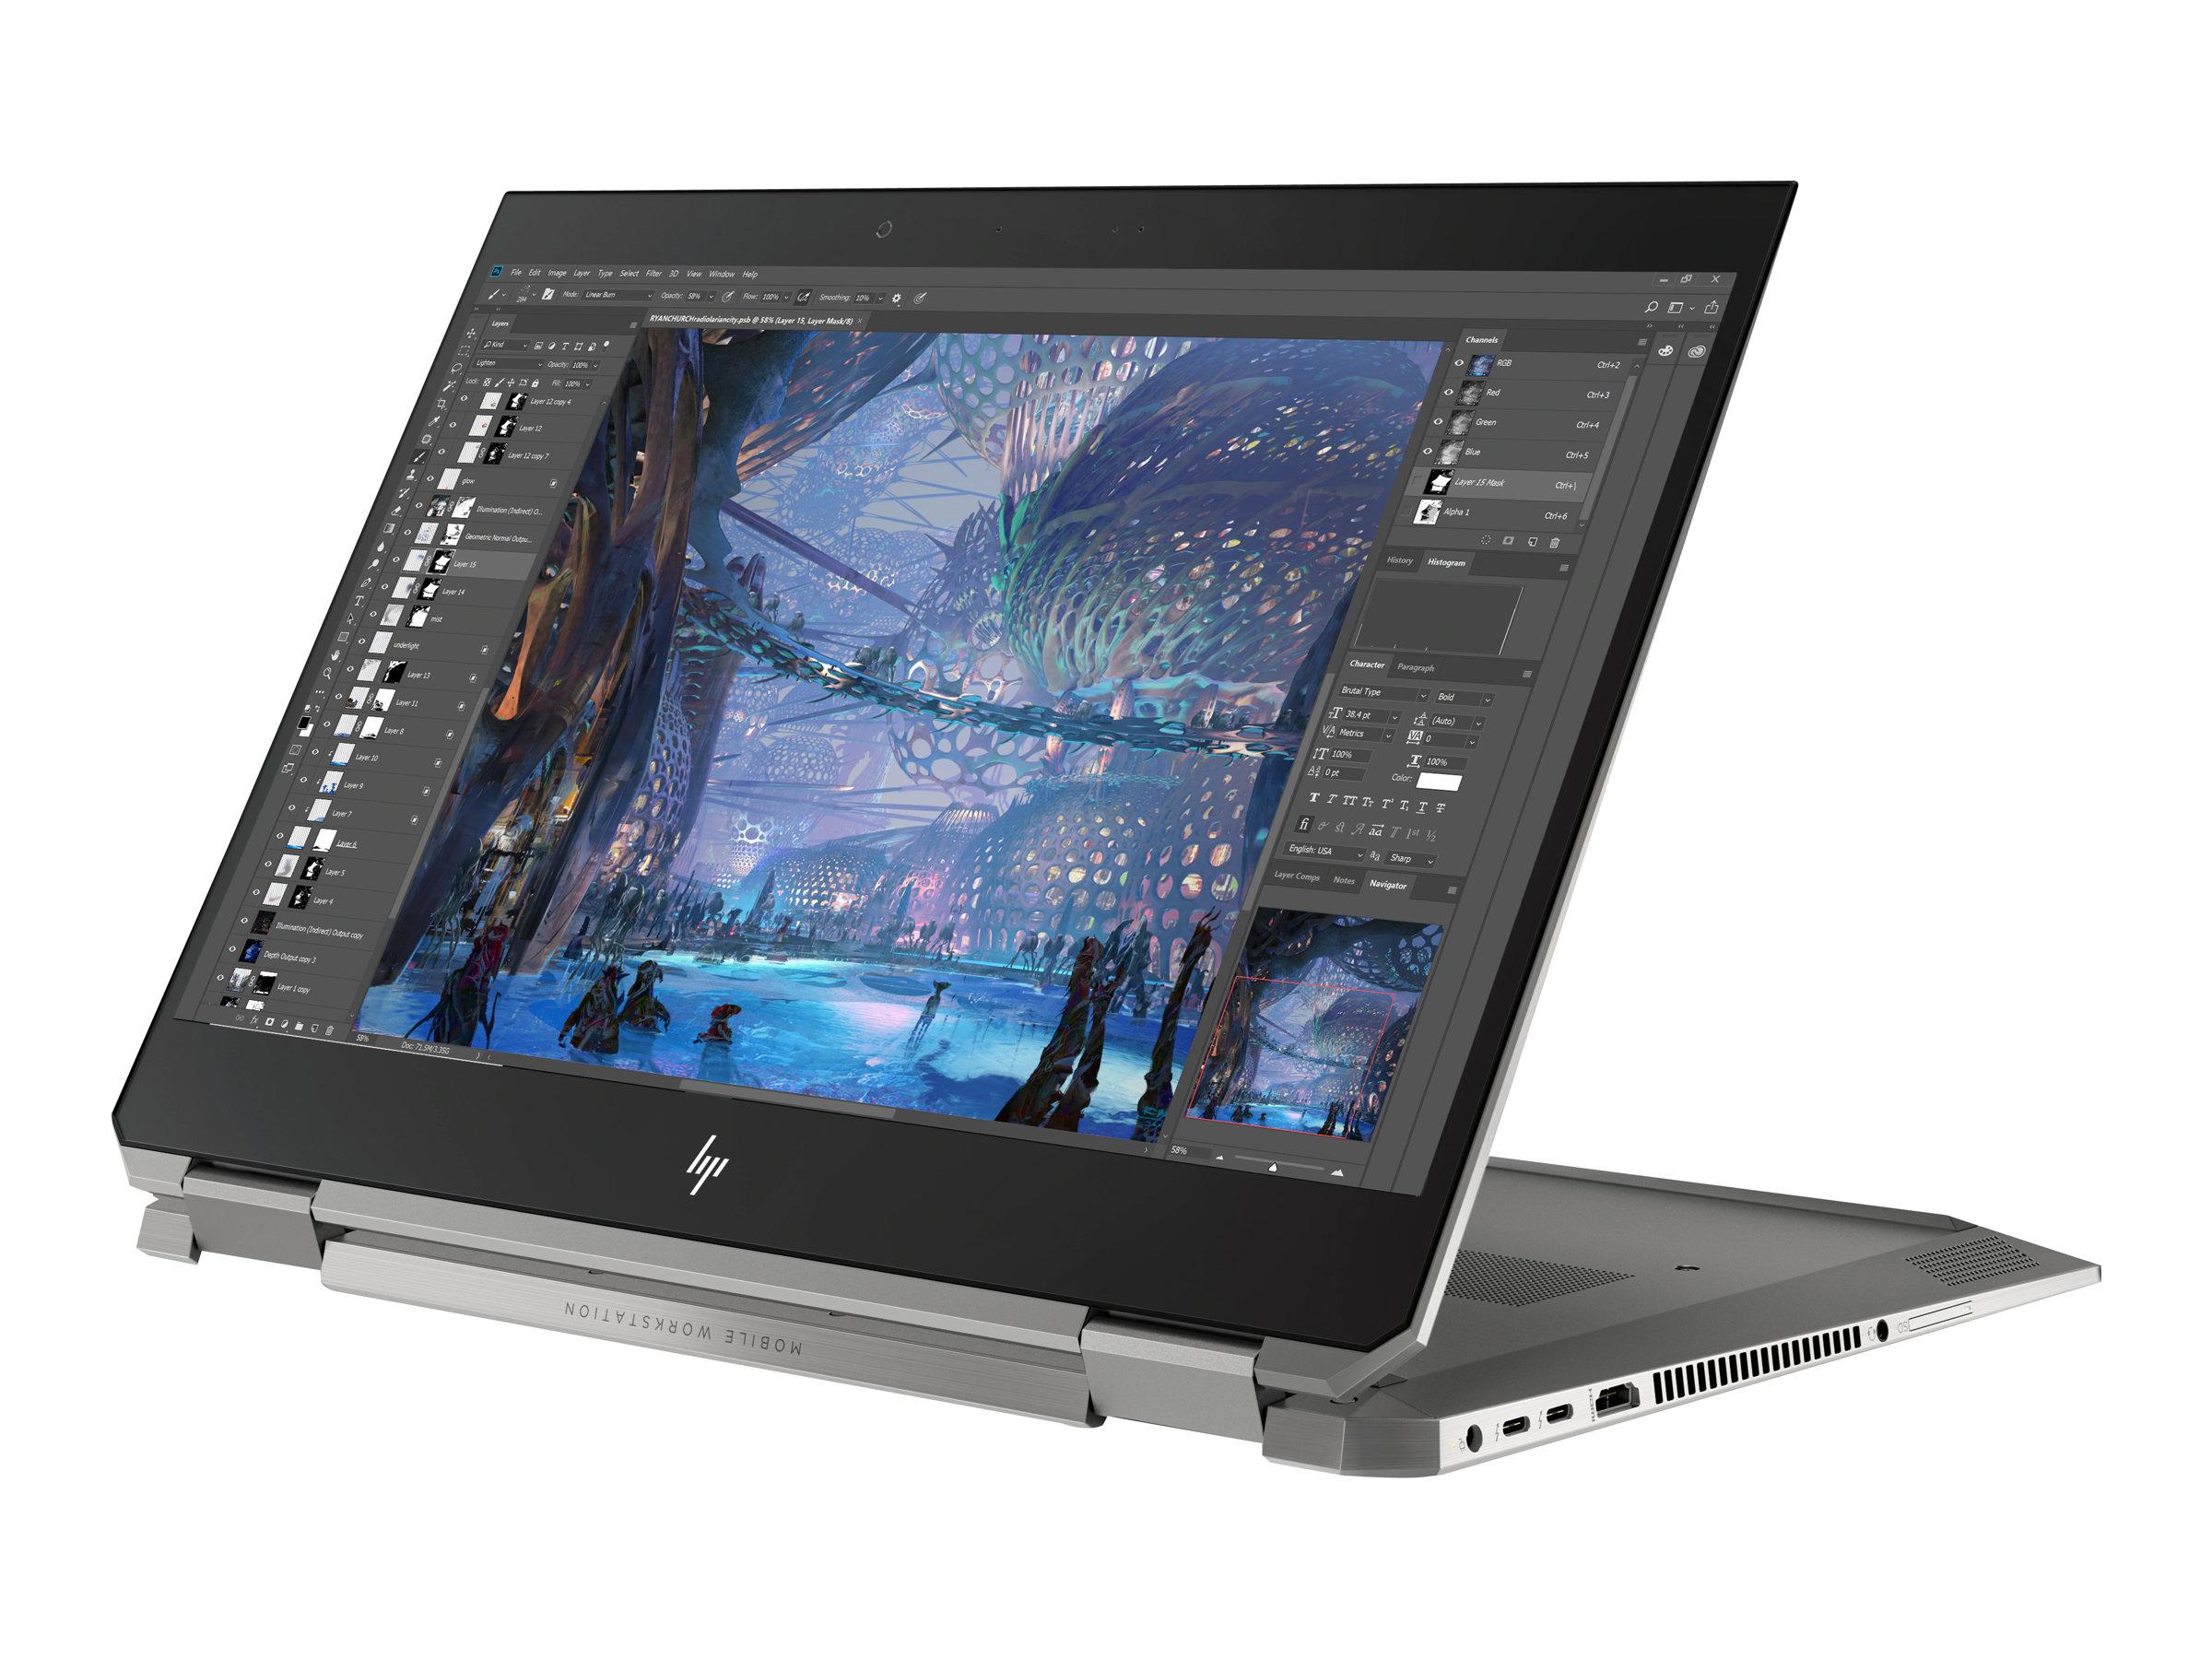 Hp zbook studio x360 g5 mobile workstation flip design core i7 9850h 2 6 ghz win 10 pro 64 bit 16 gb ram 512 gb ssd nvme 11919924 6tw61ea abd